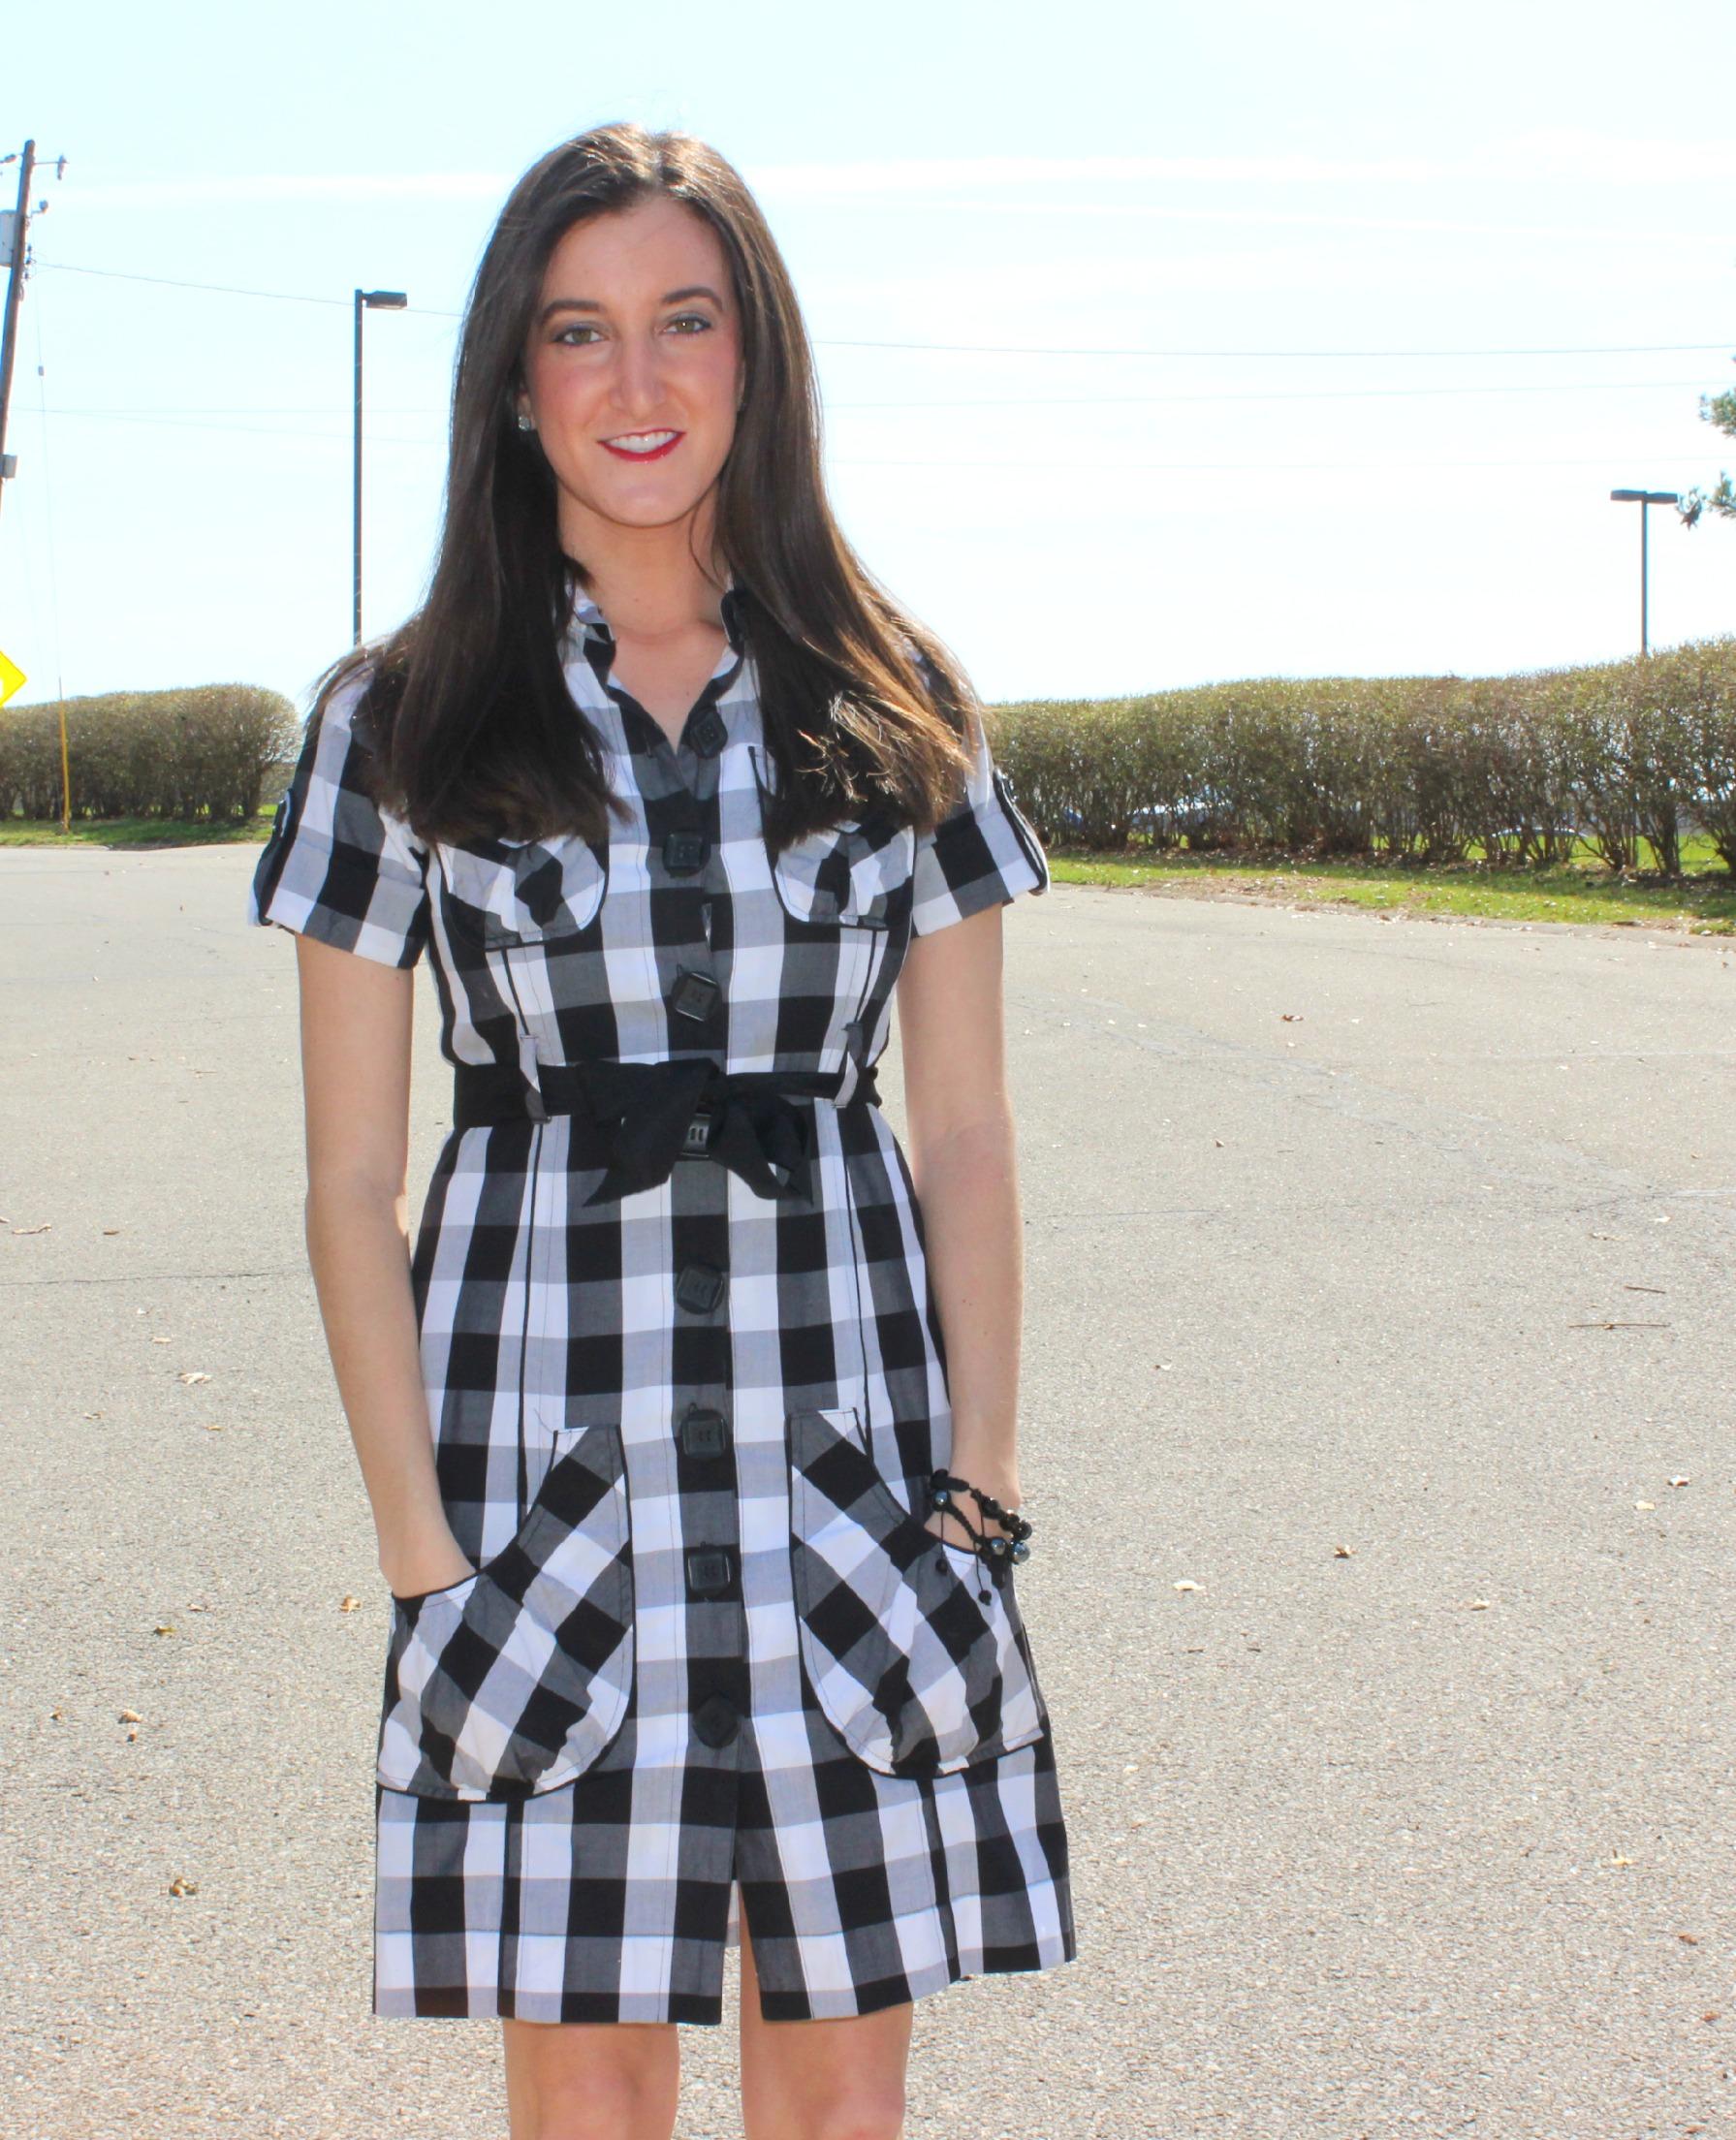 Black and White Checkered Print Dress